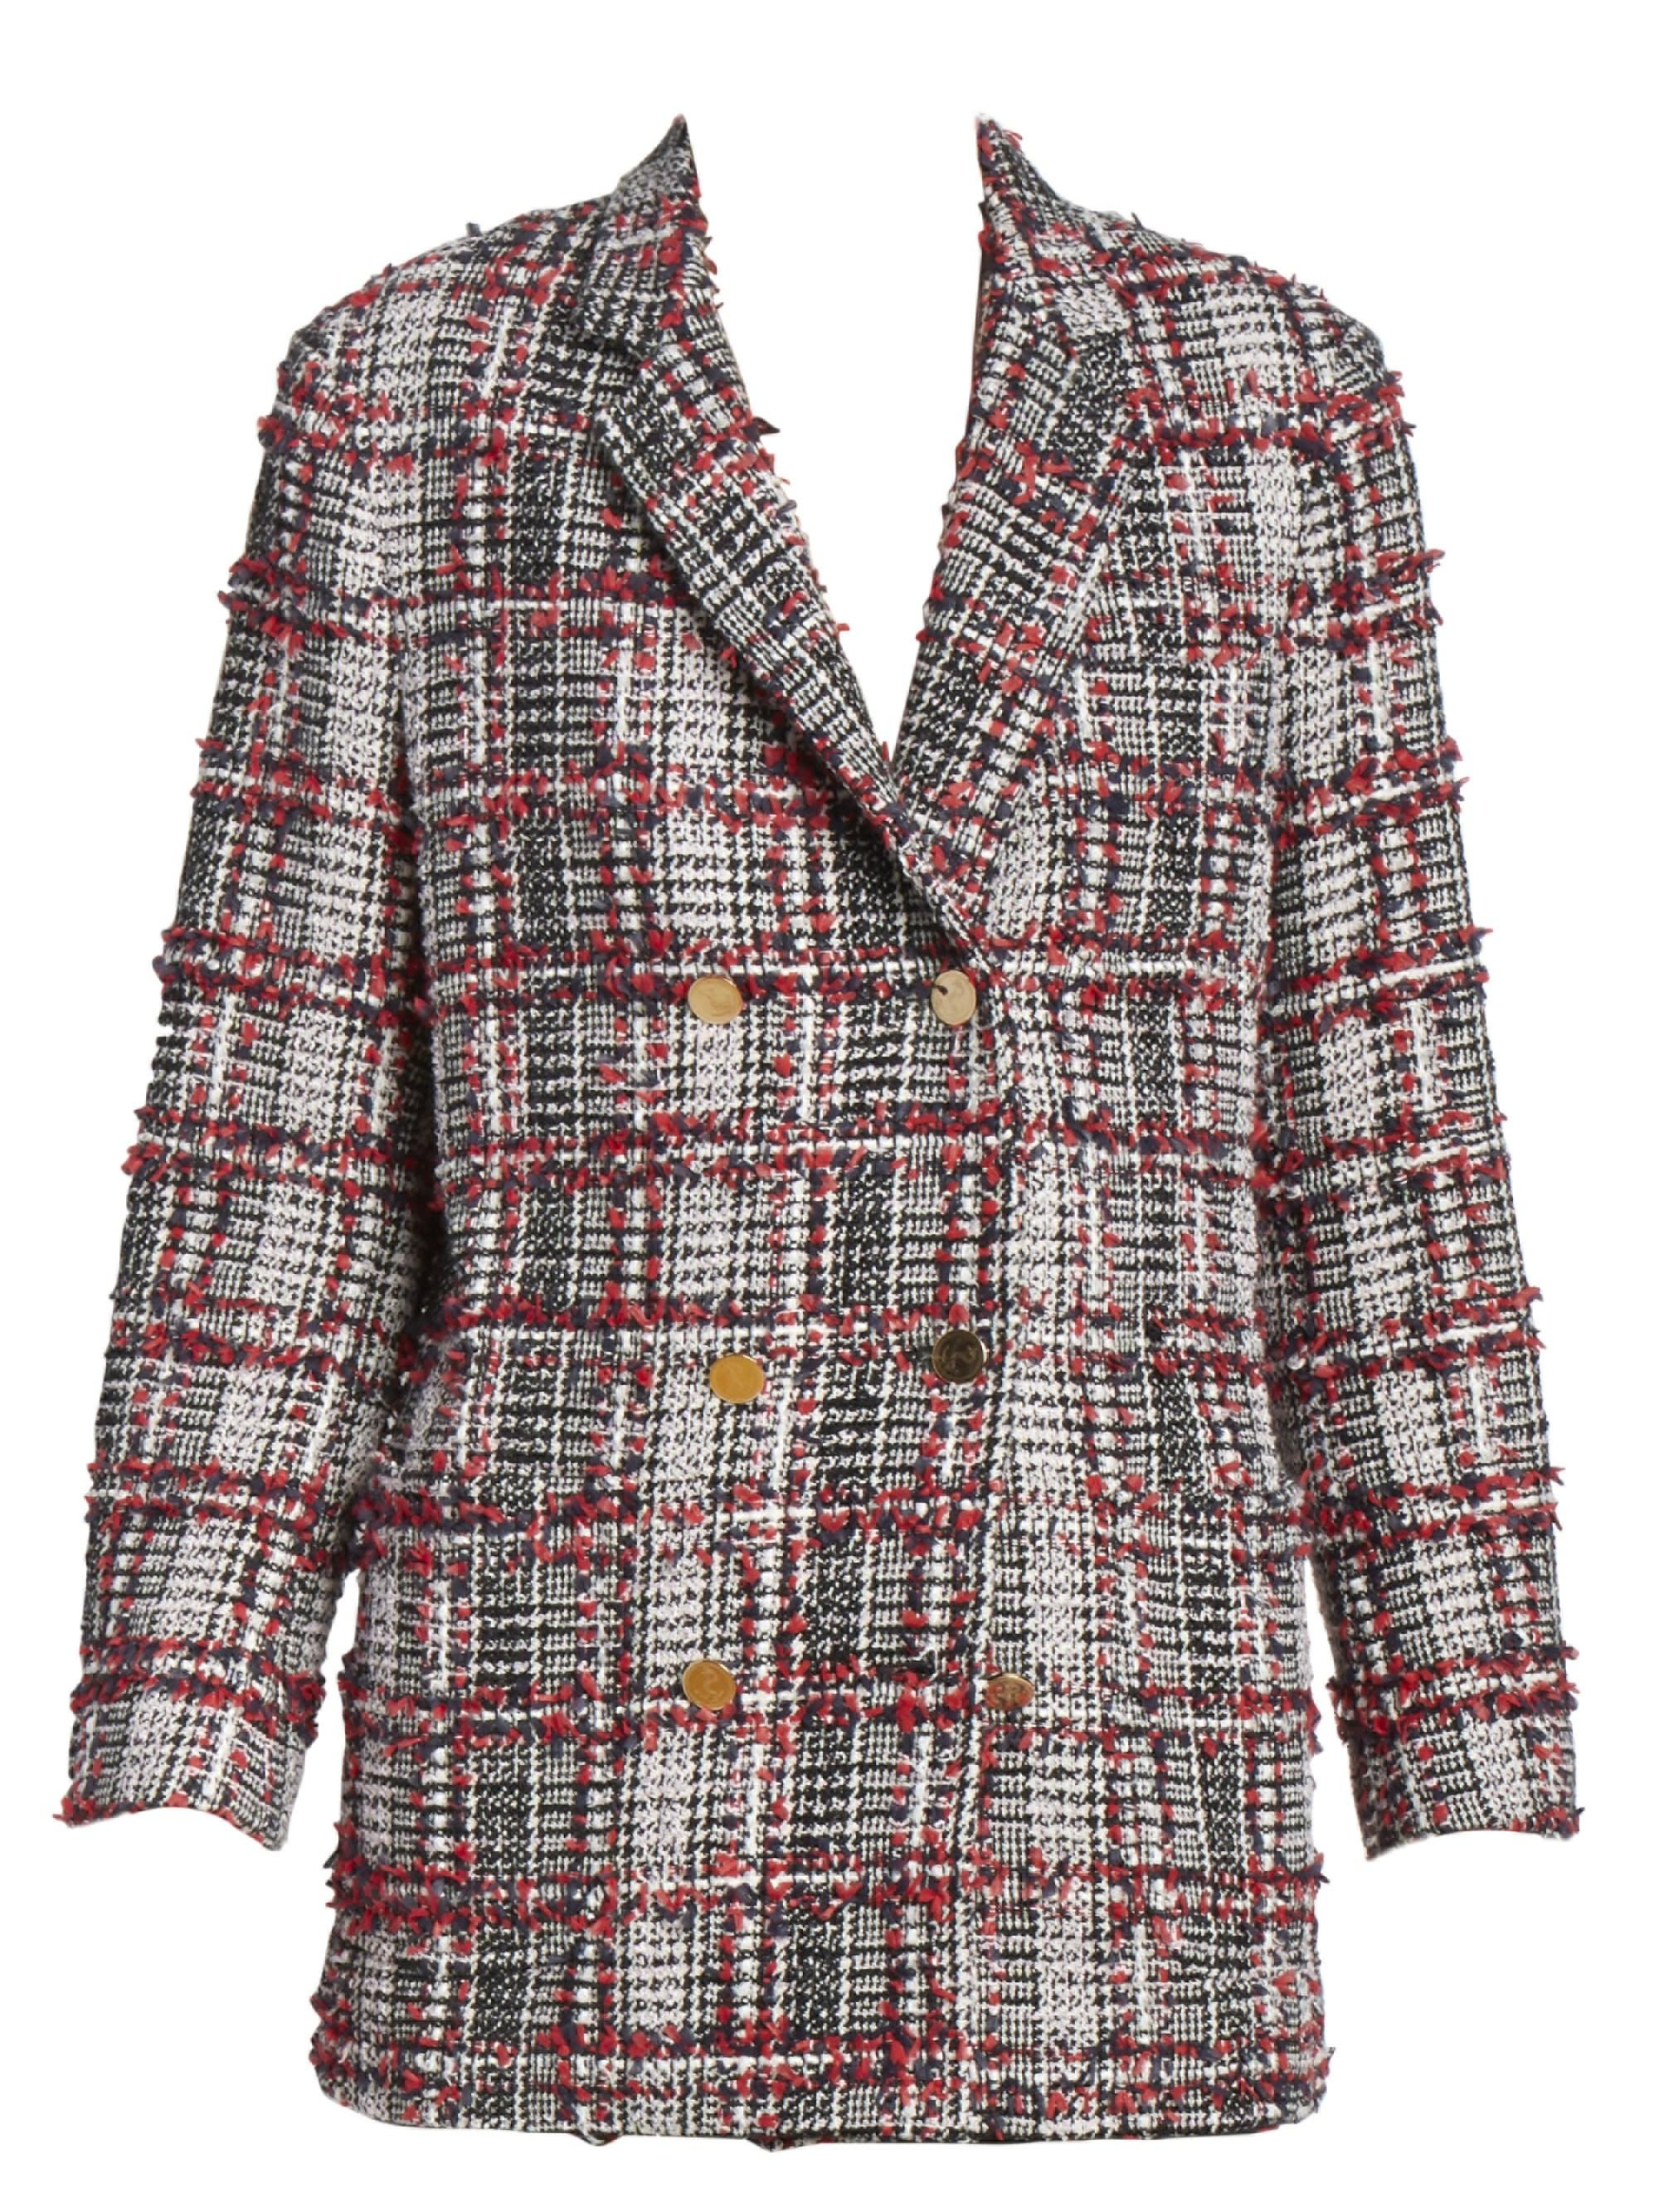 a90fb9b35fd Thom Browne Women's Double Breasted Tweed Wool-blend Sack Jacket ...